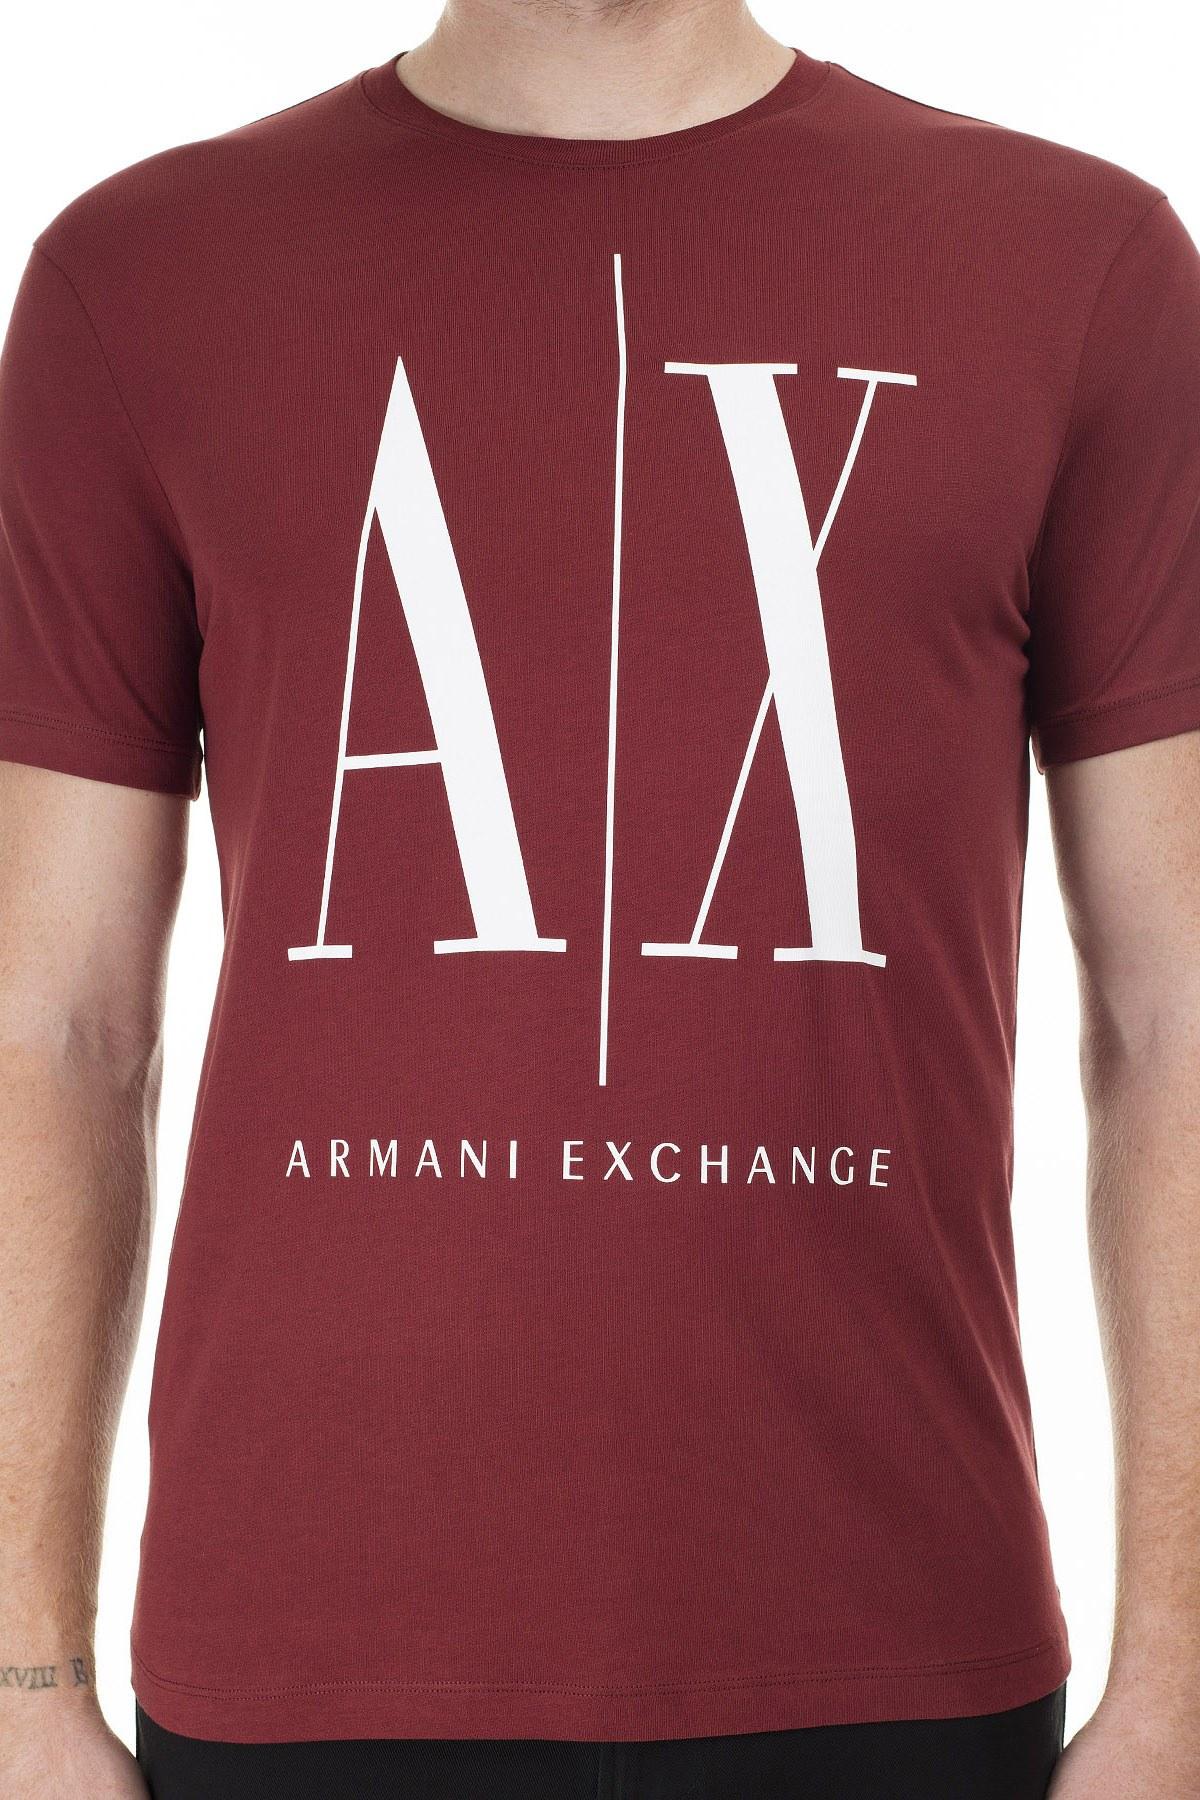 Armani Exchange Logo Baskılı Bisiklet Yaka Erkek T Shirt 8NZTPA ZJH4Z 1701 KİREMİT